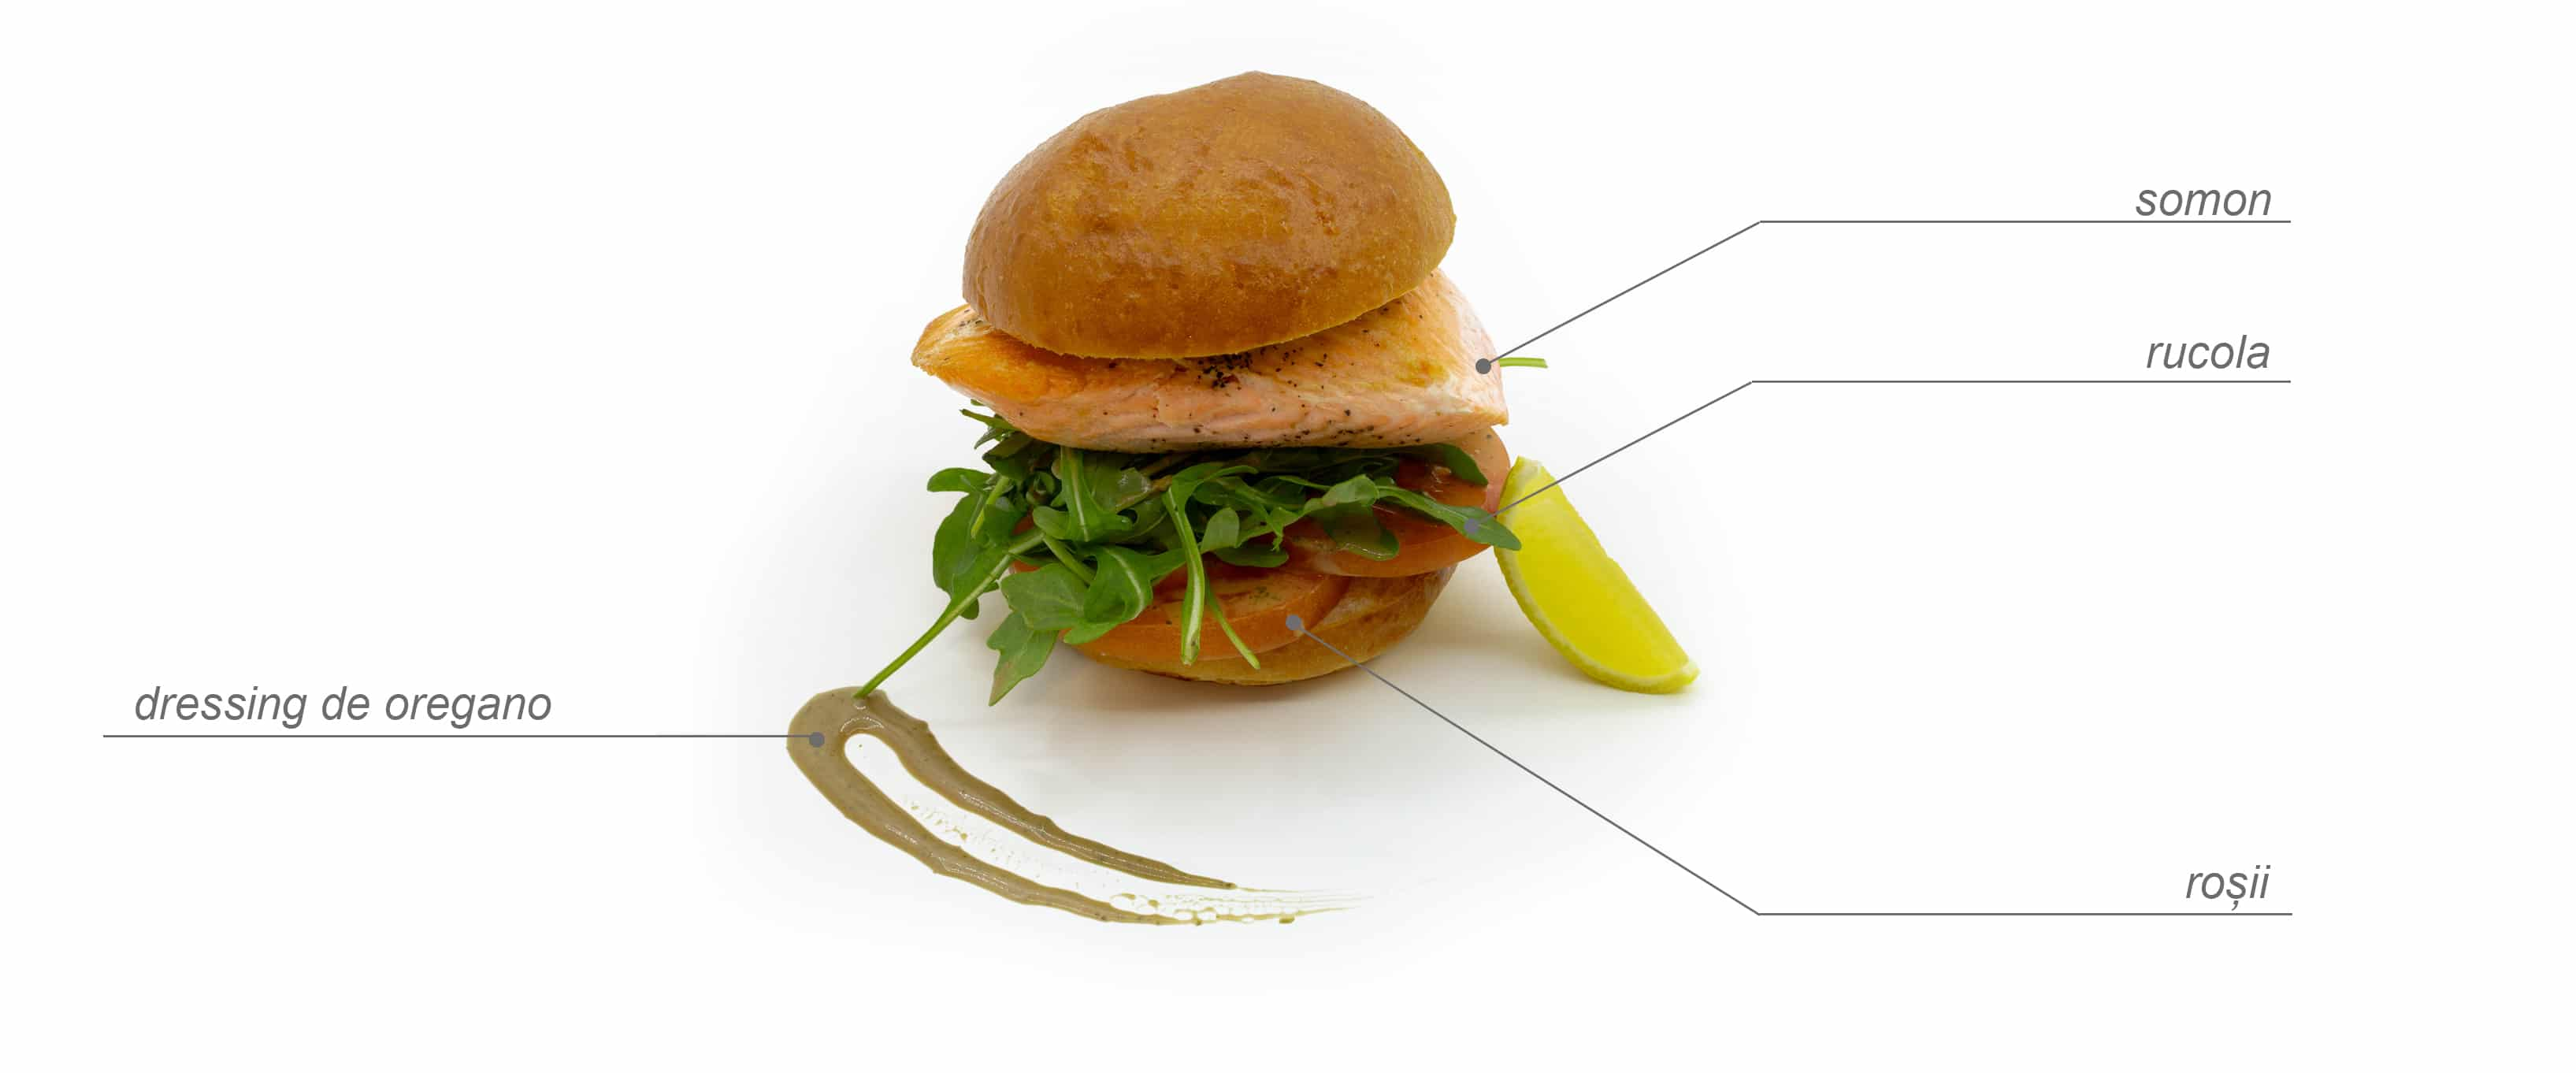 Sandwich de somon cu rucola